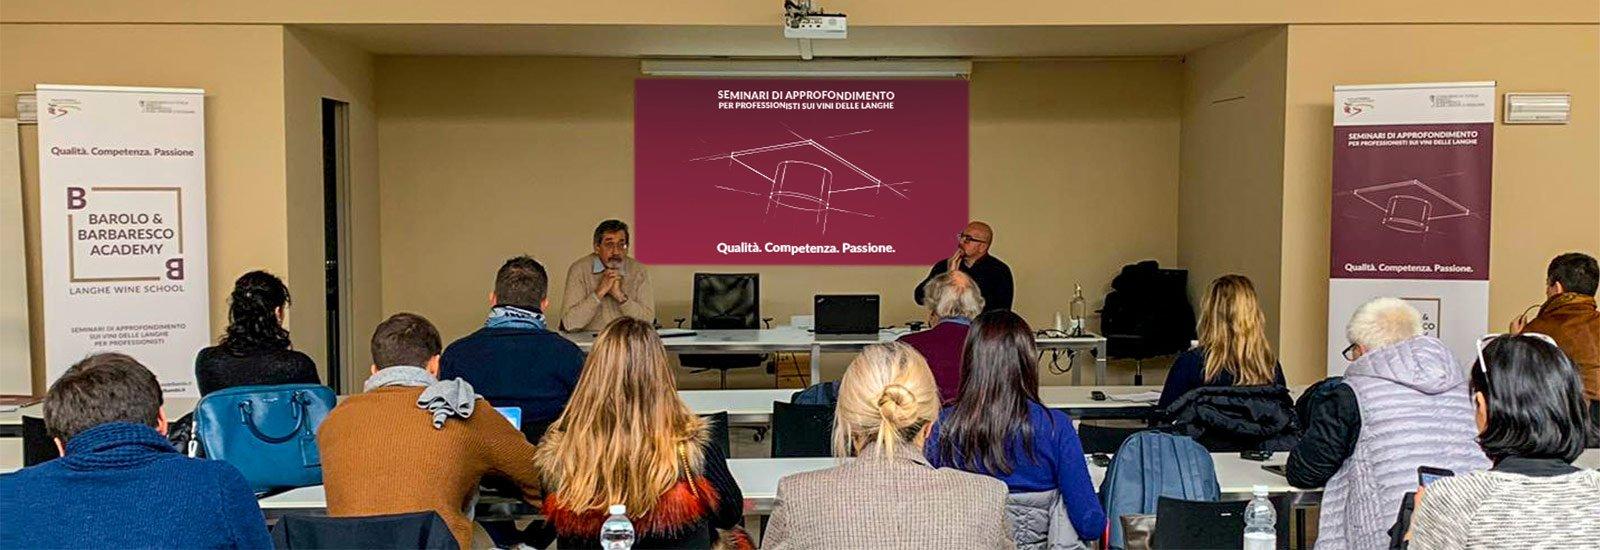 Barolo & Barbaresco Academy - Langhe Wine School